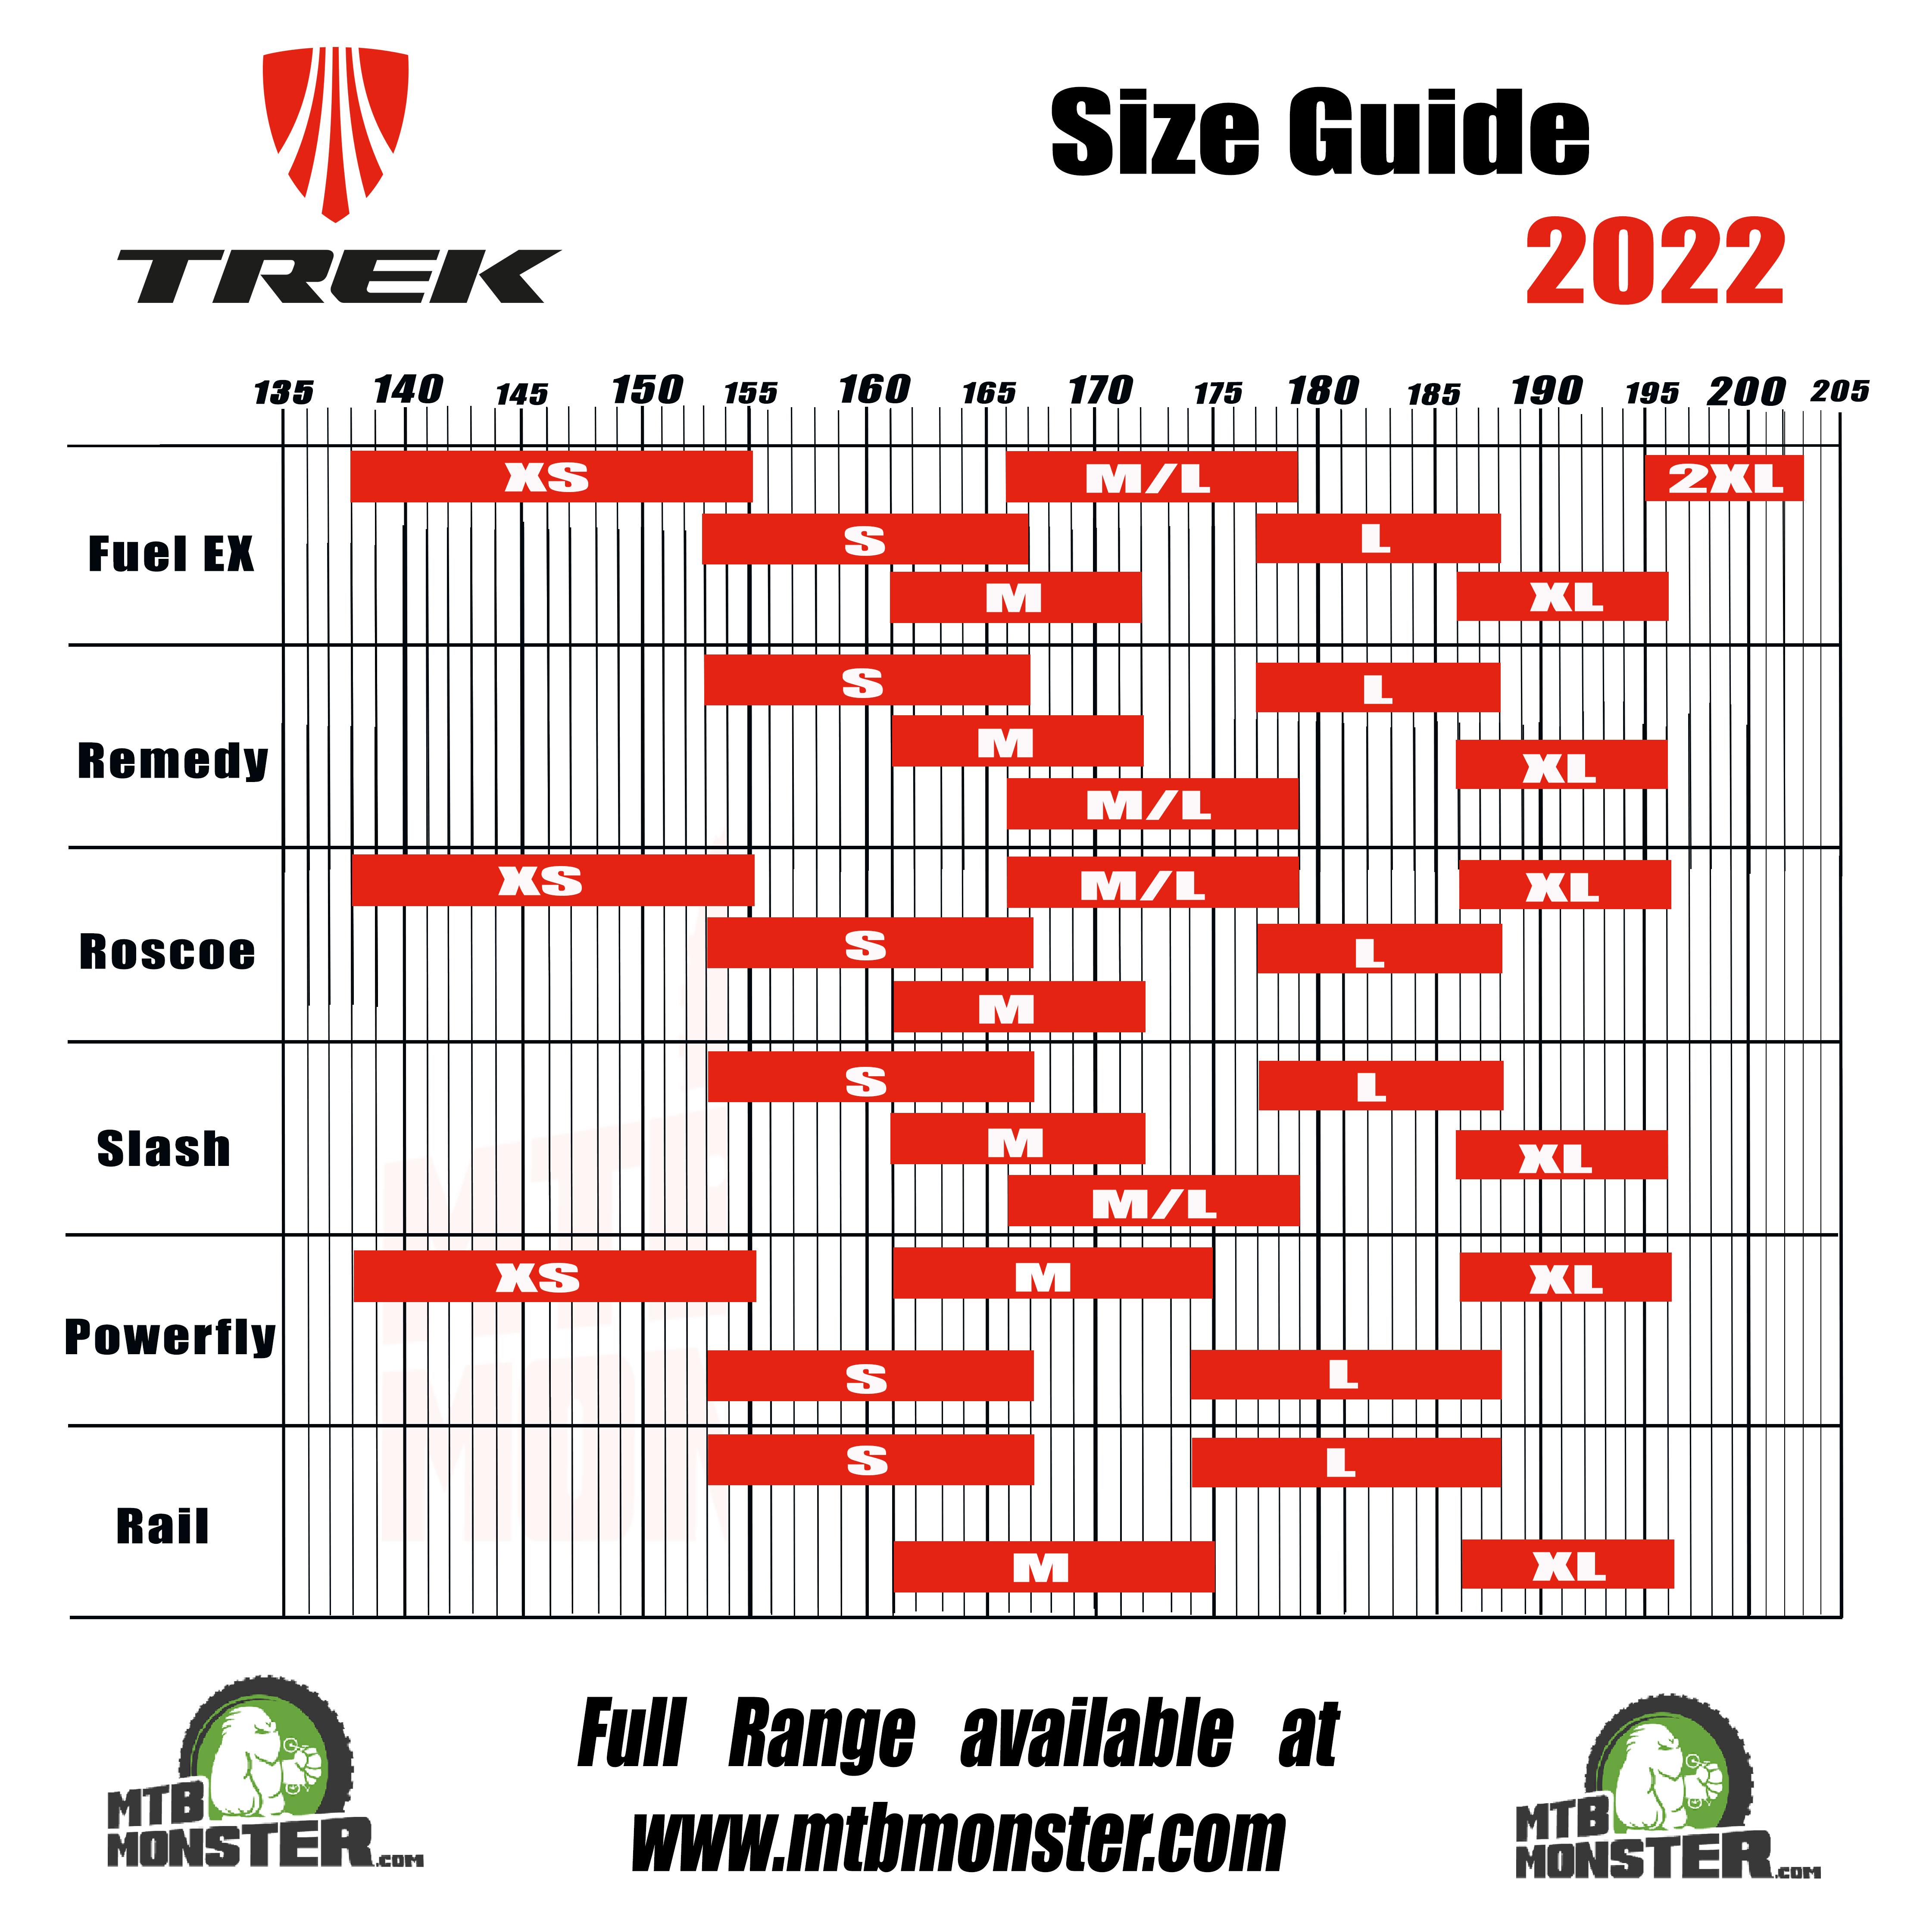 trek-size-chart-2022